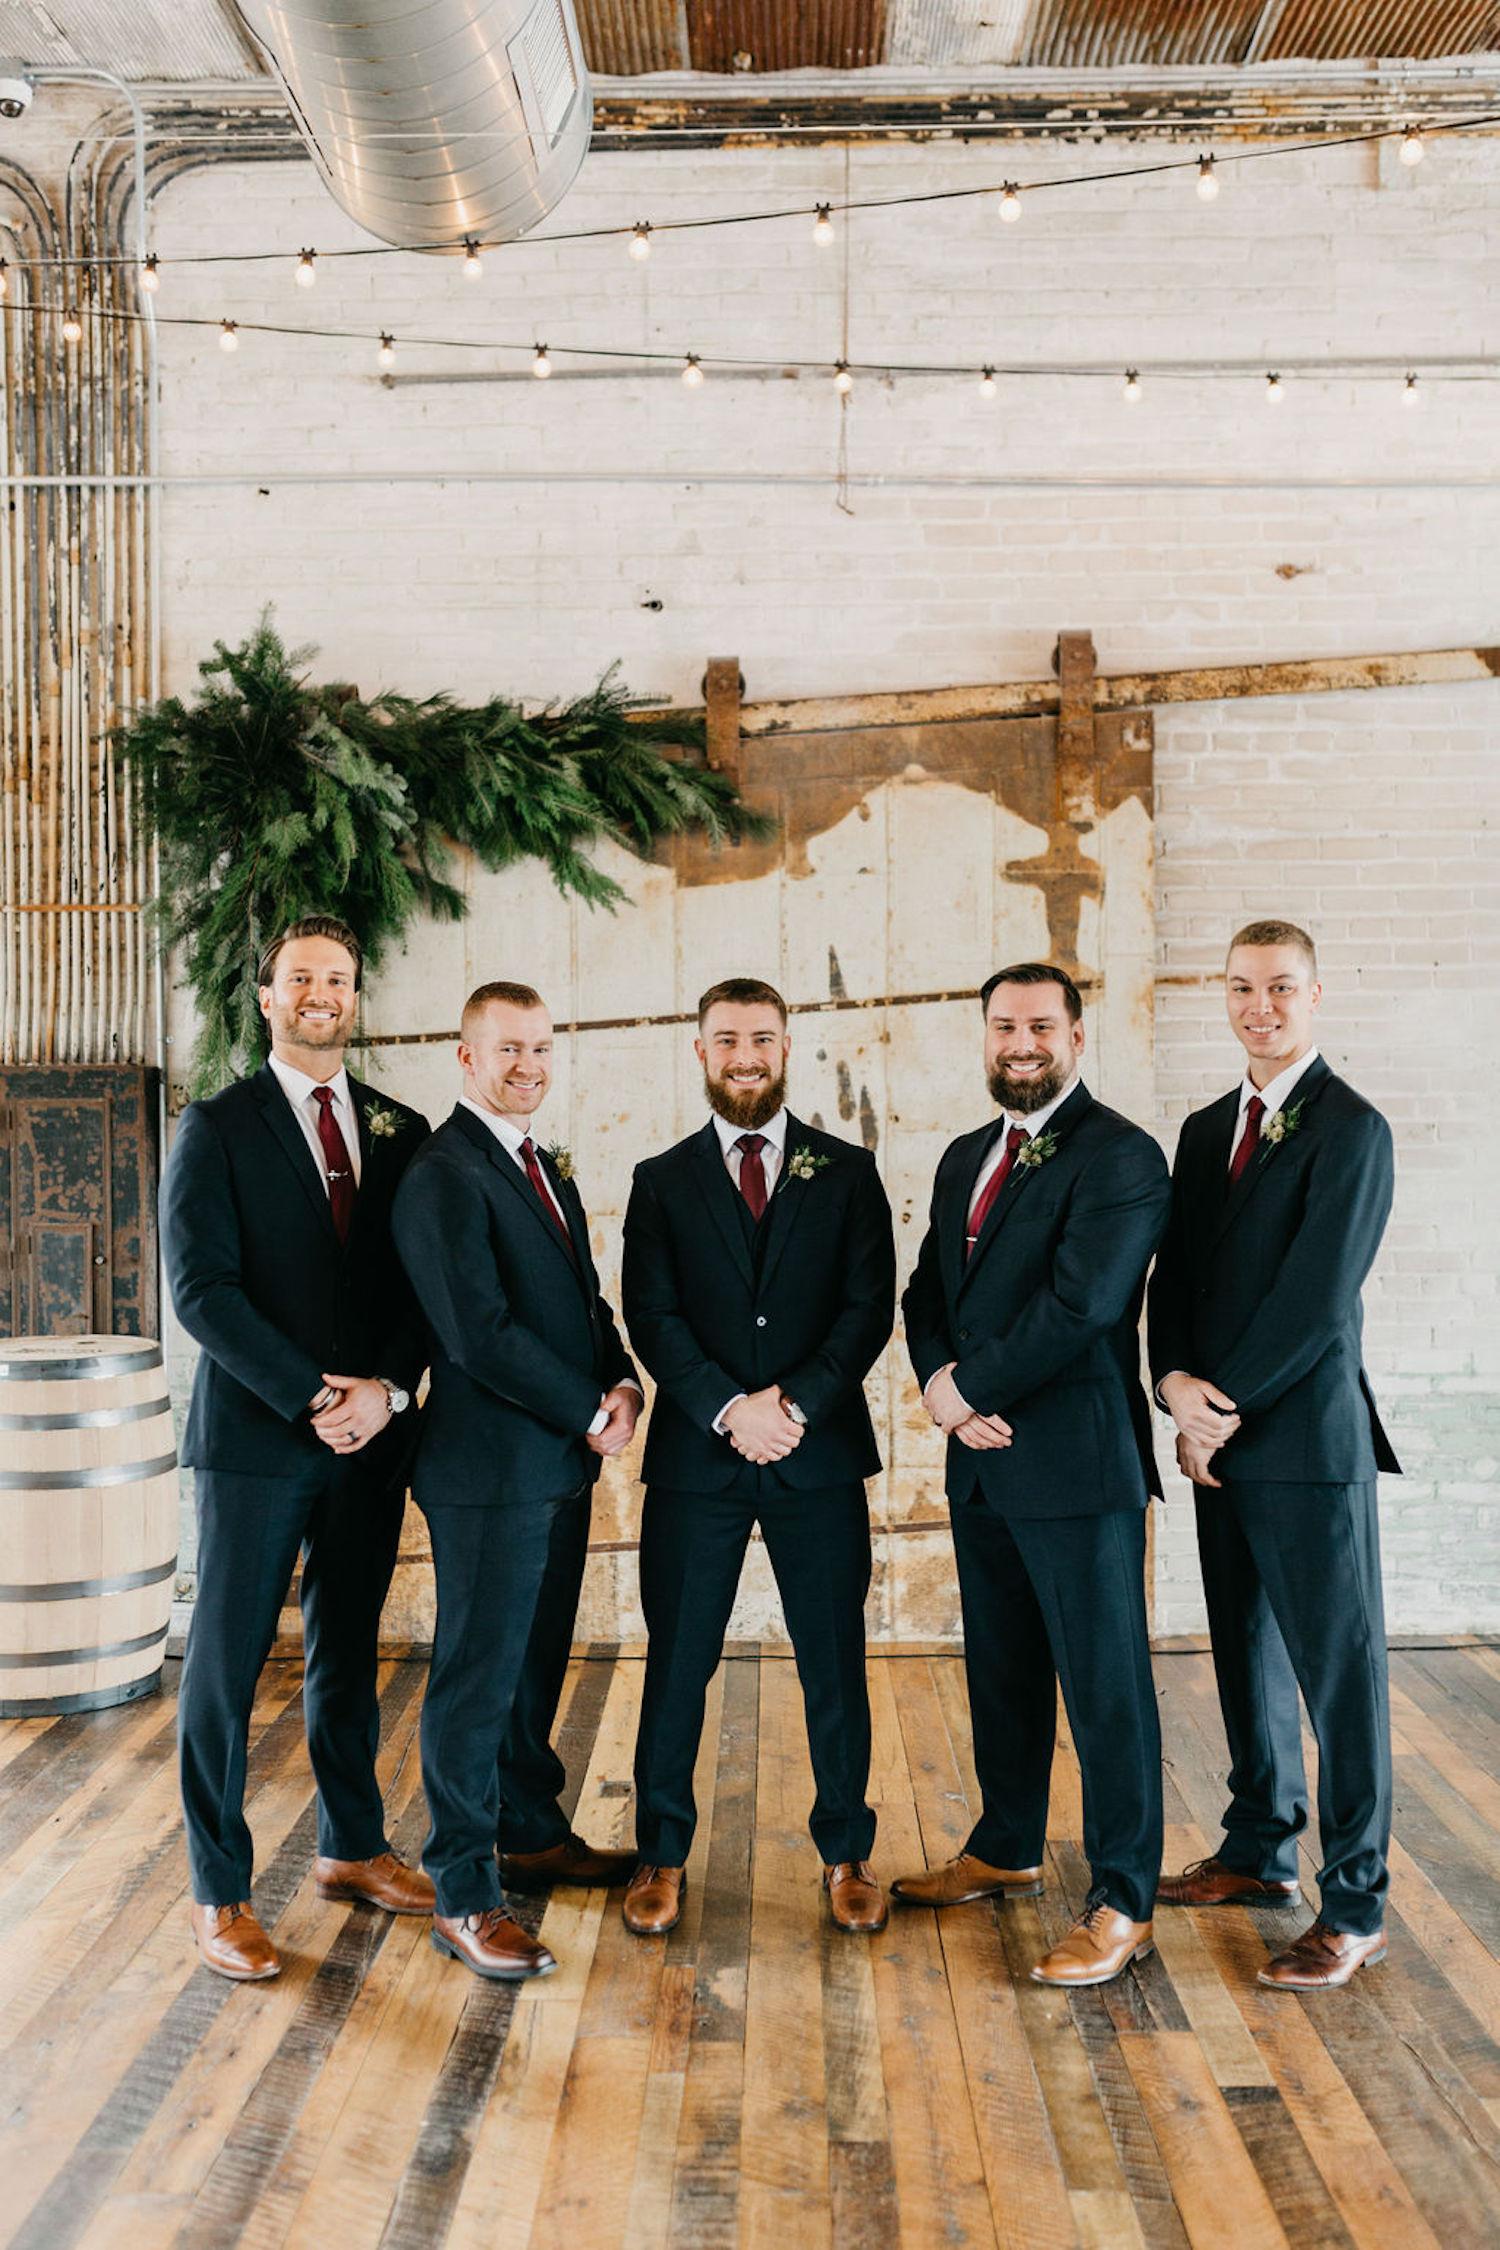 Grooms and groomsman standing before Journeyman Distillery wedding